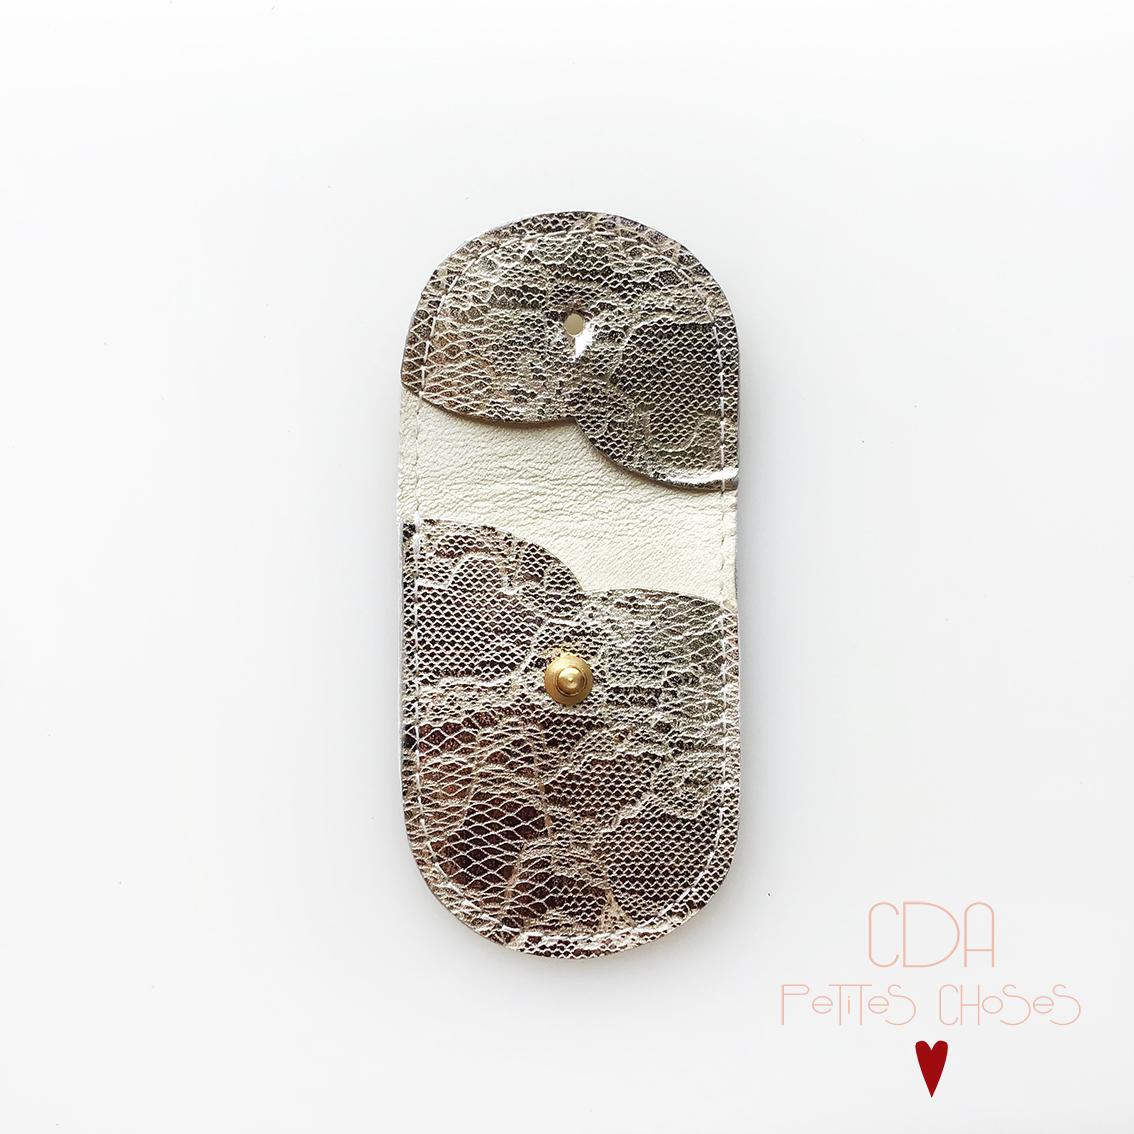 mini-pochette-en-cuir-embosse-dentelle-2 CDA Petites Choses